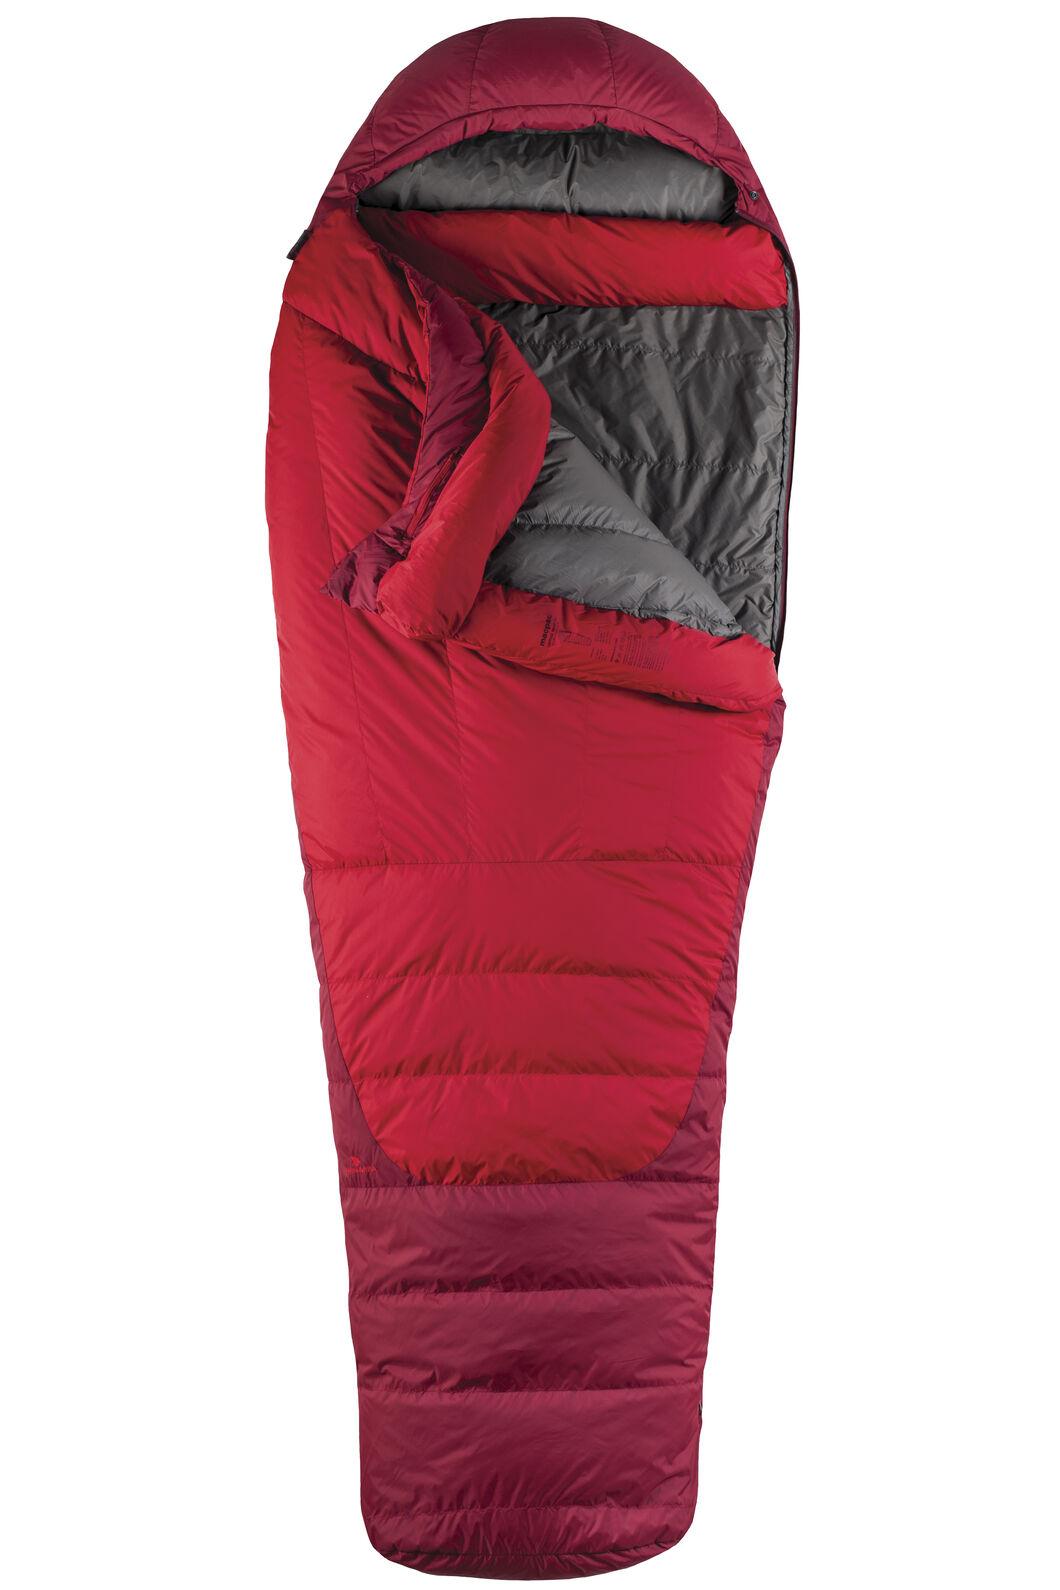 Macpac Latitude XP Goose Down 500 Sleeping Bag - Women's, Chilli, hi-res